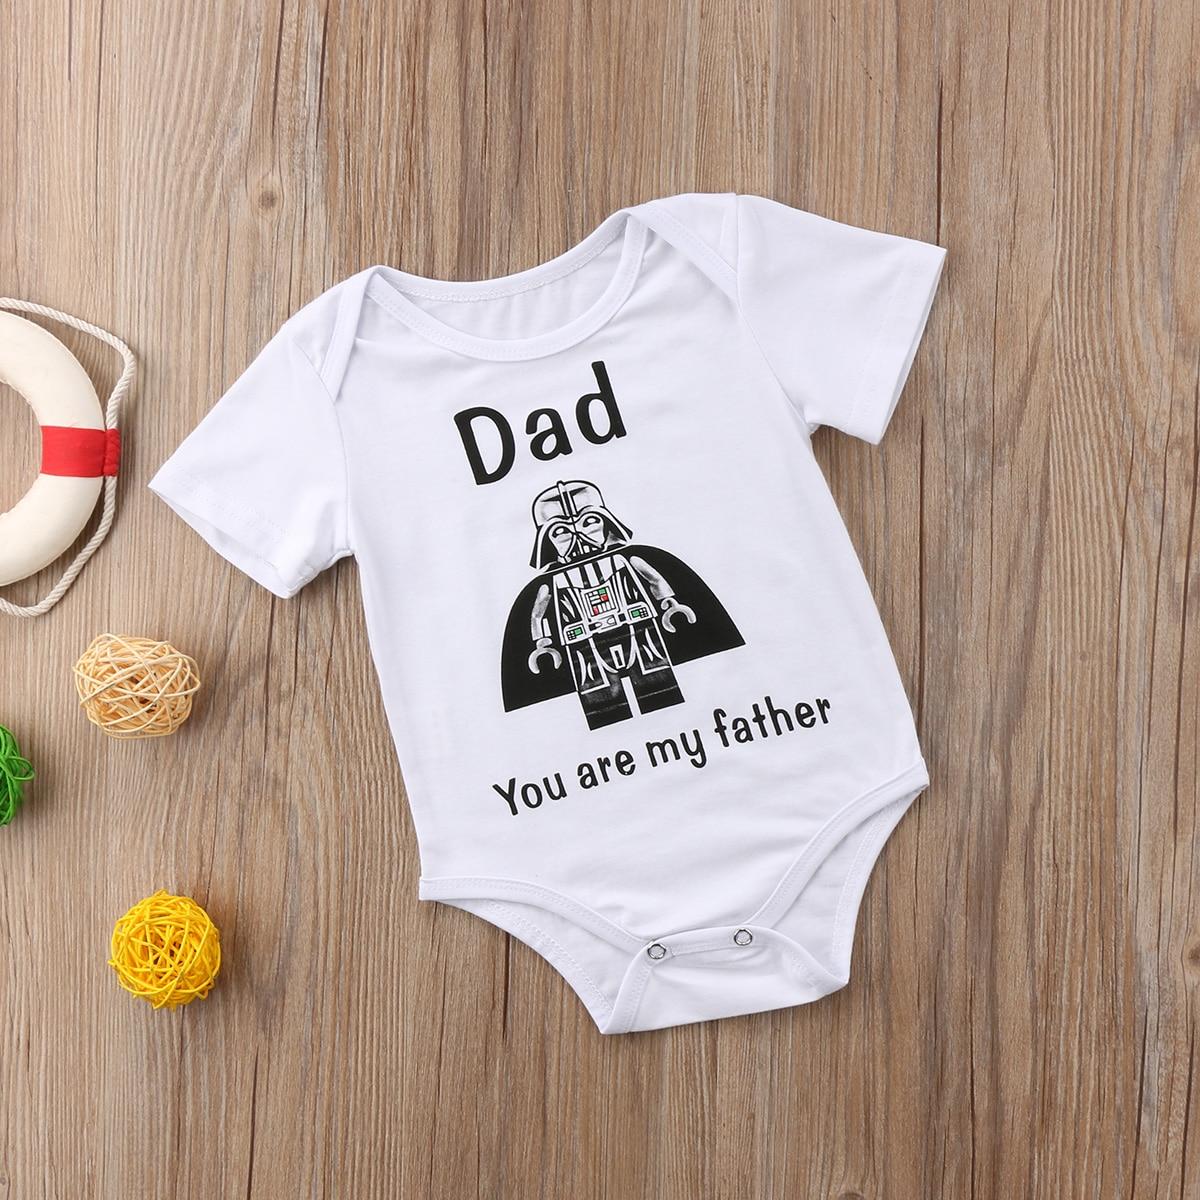 Summer Newborn Infant Toddler Baby Boy Clothes Bodysuits Cartoon Star War Bodysuit Jumpsuit Outfit Clothes